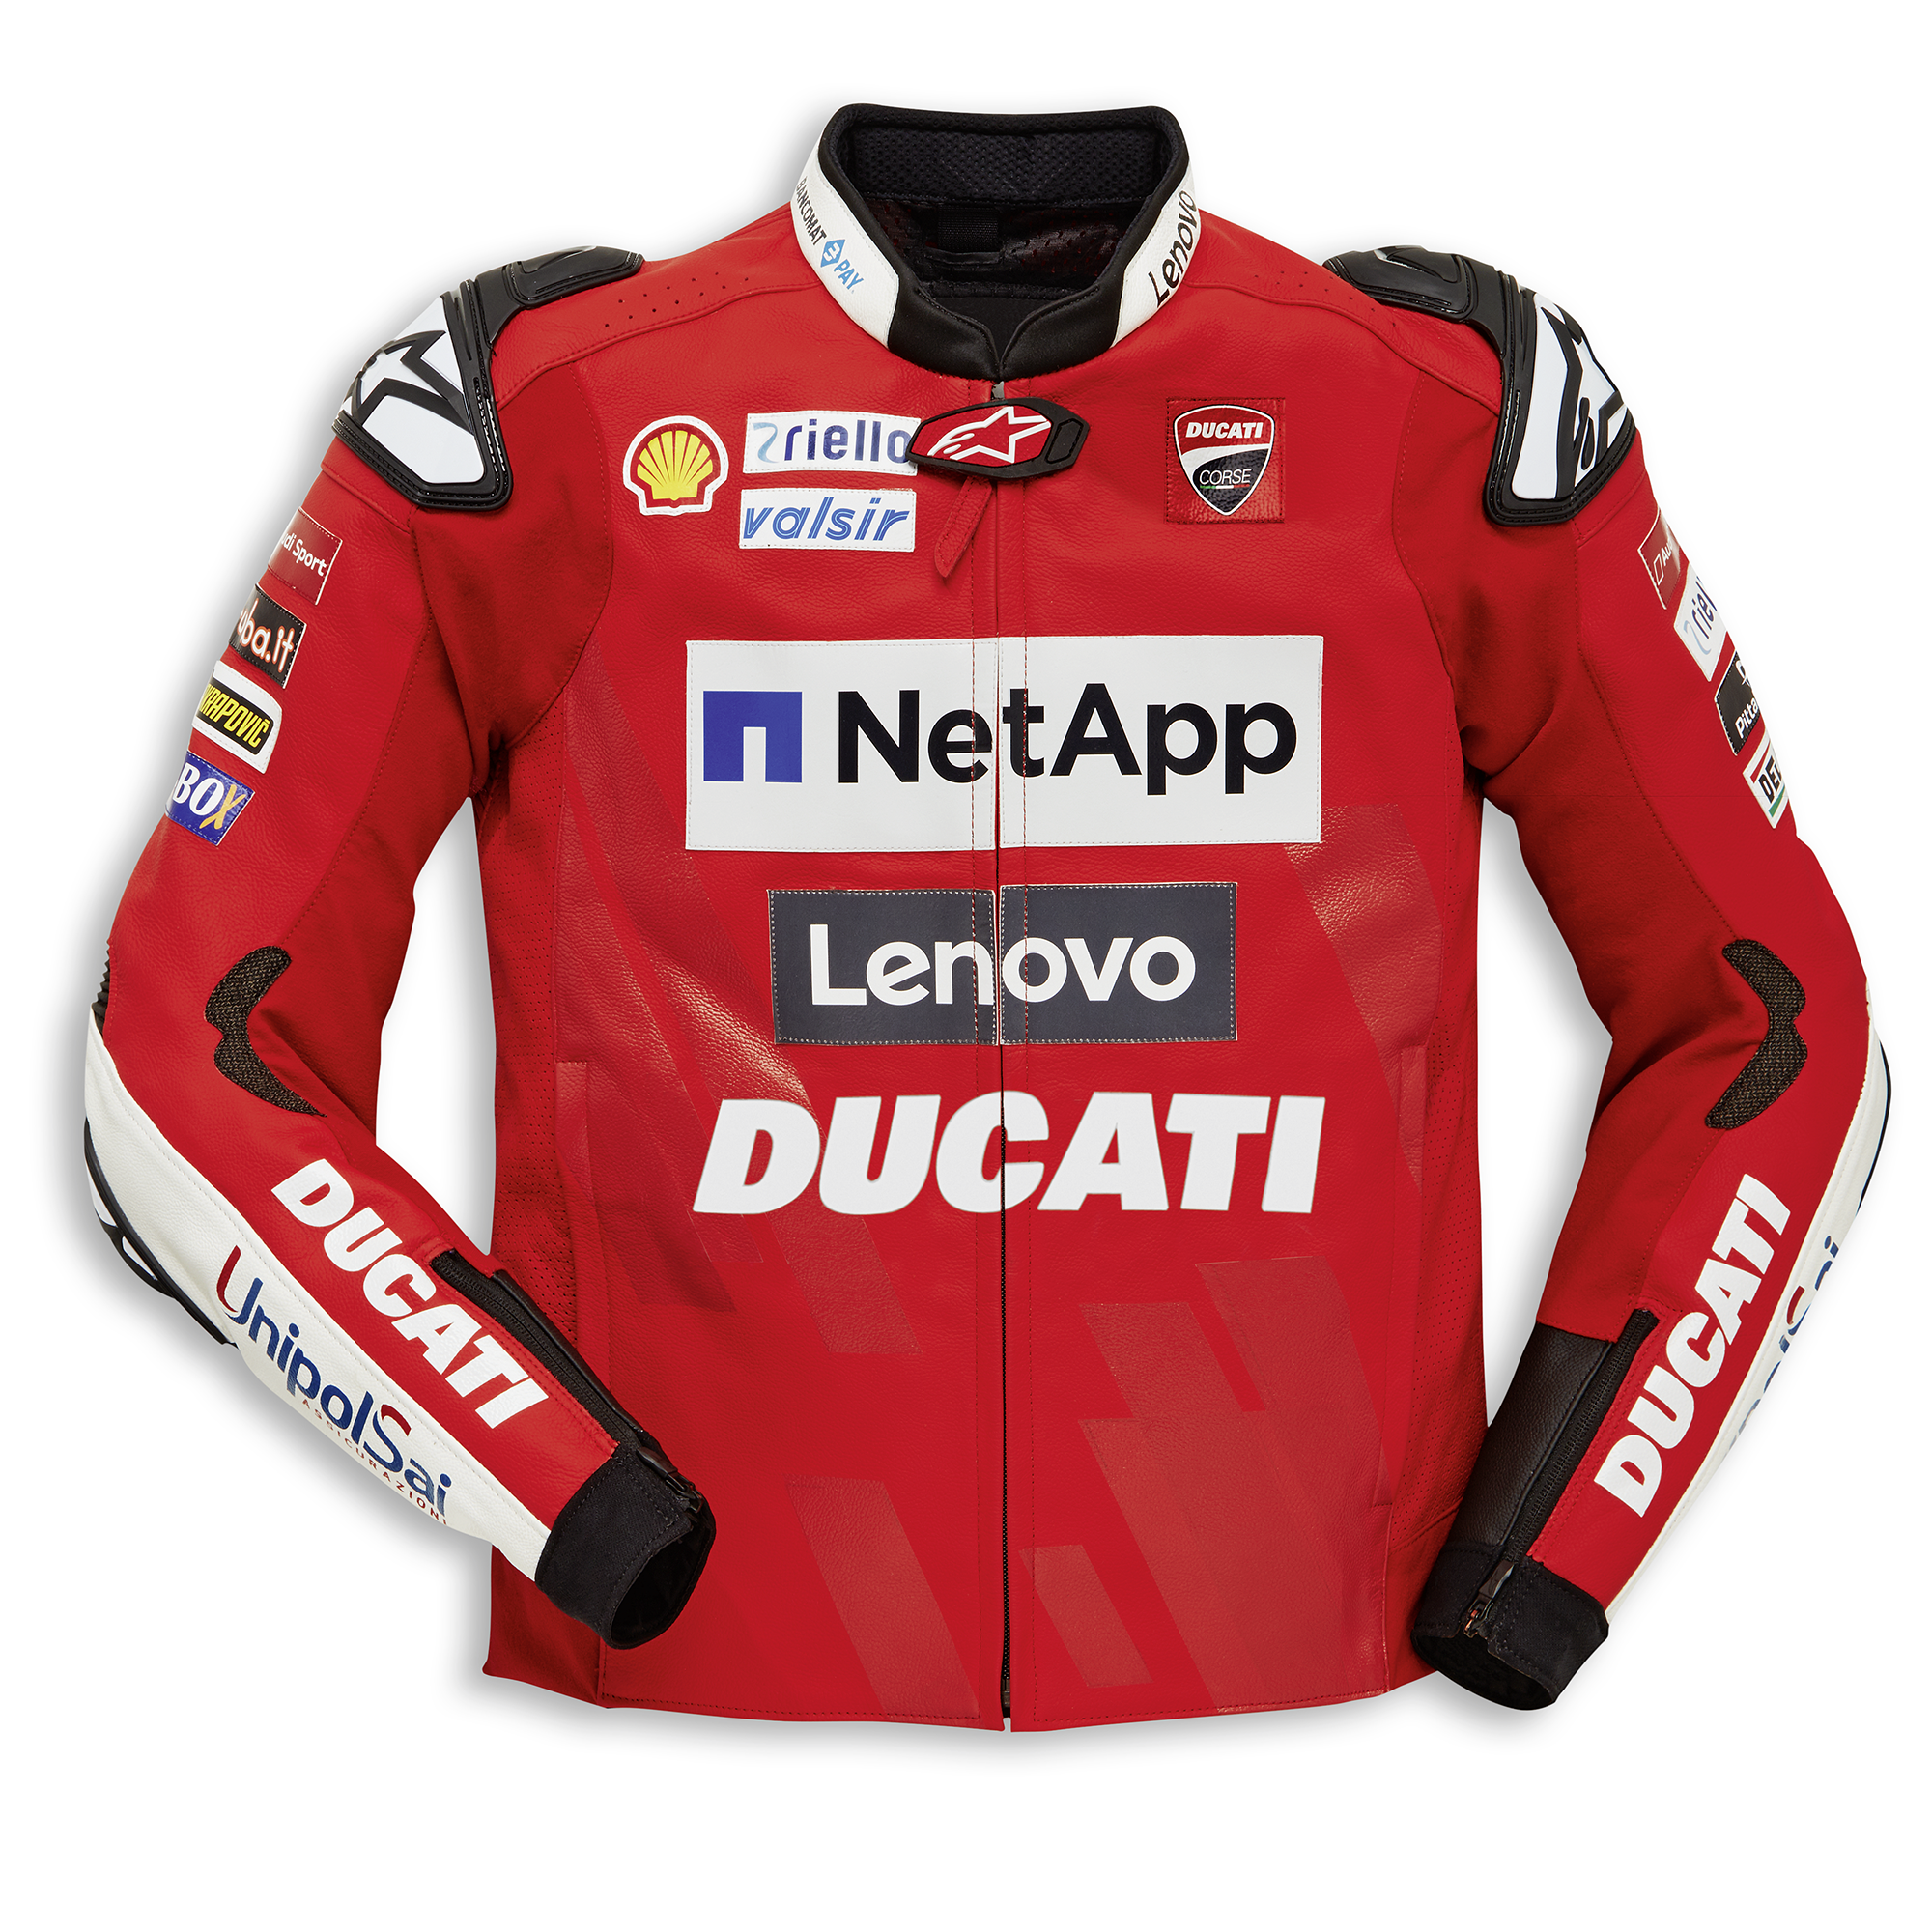 Replica Ducati Team 19 - Leather jacket 9810712